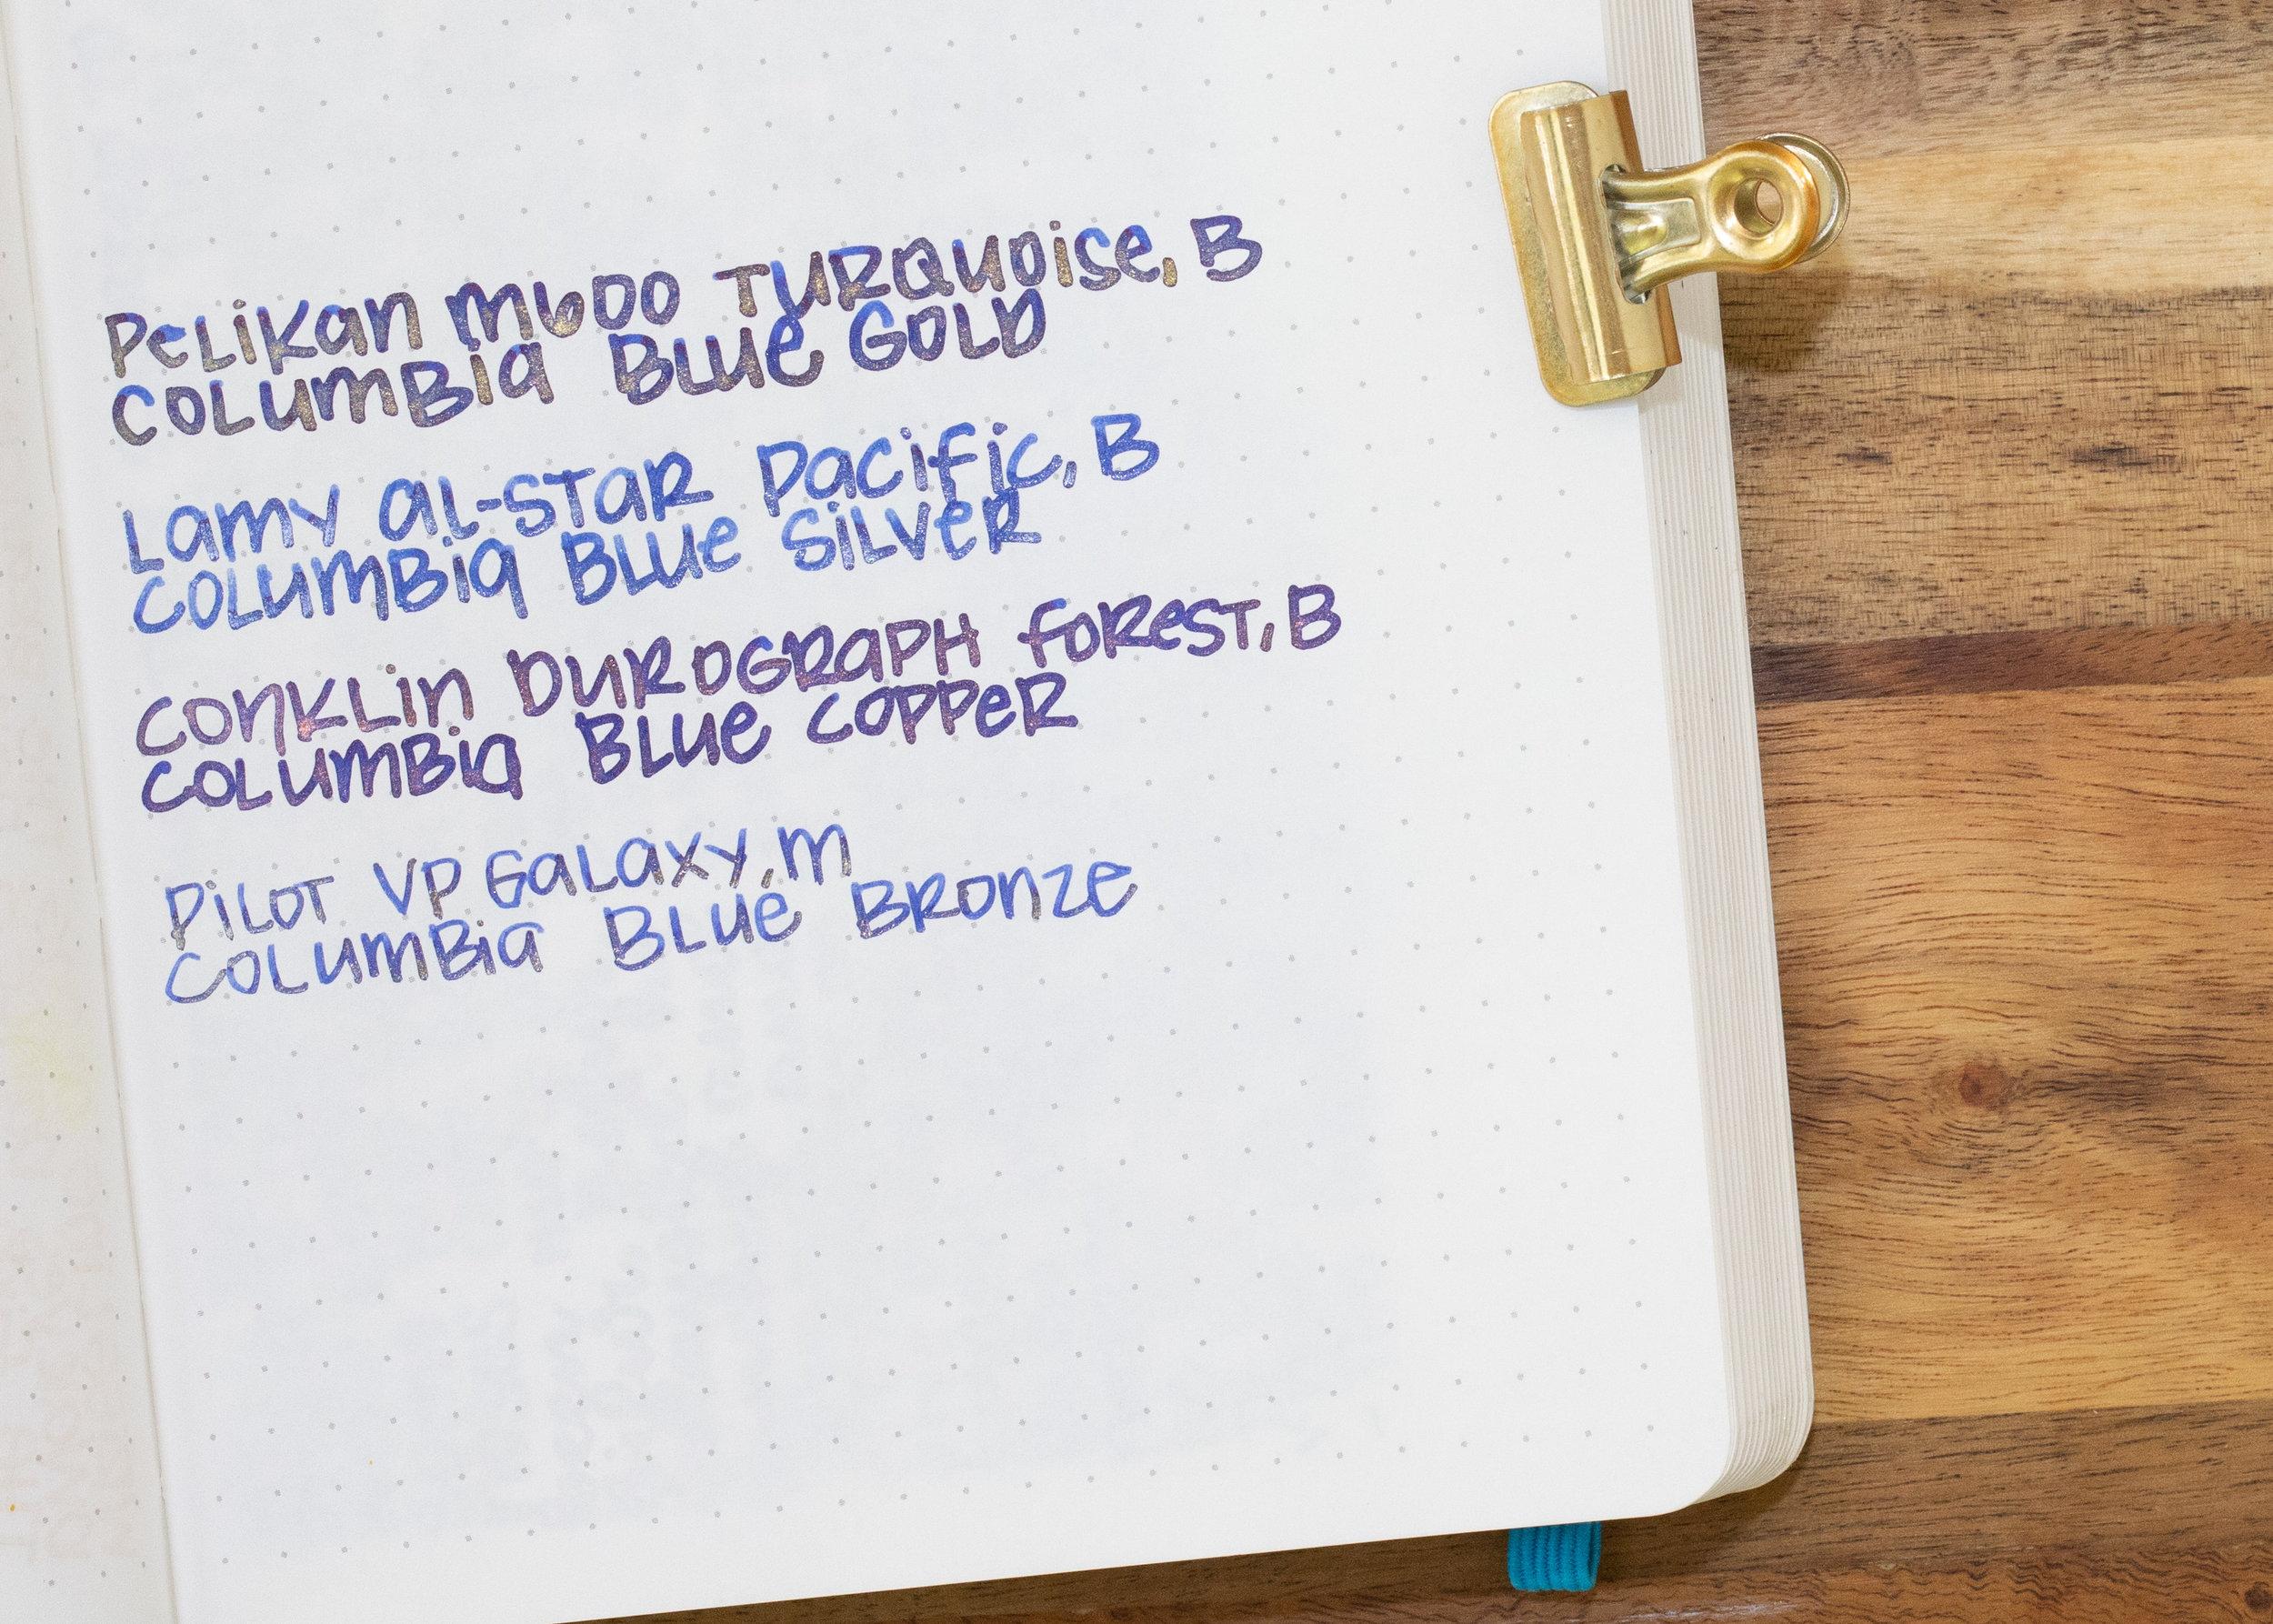 da-columbia-blue-w-2.jpg